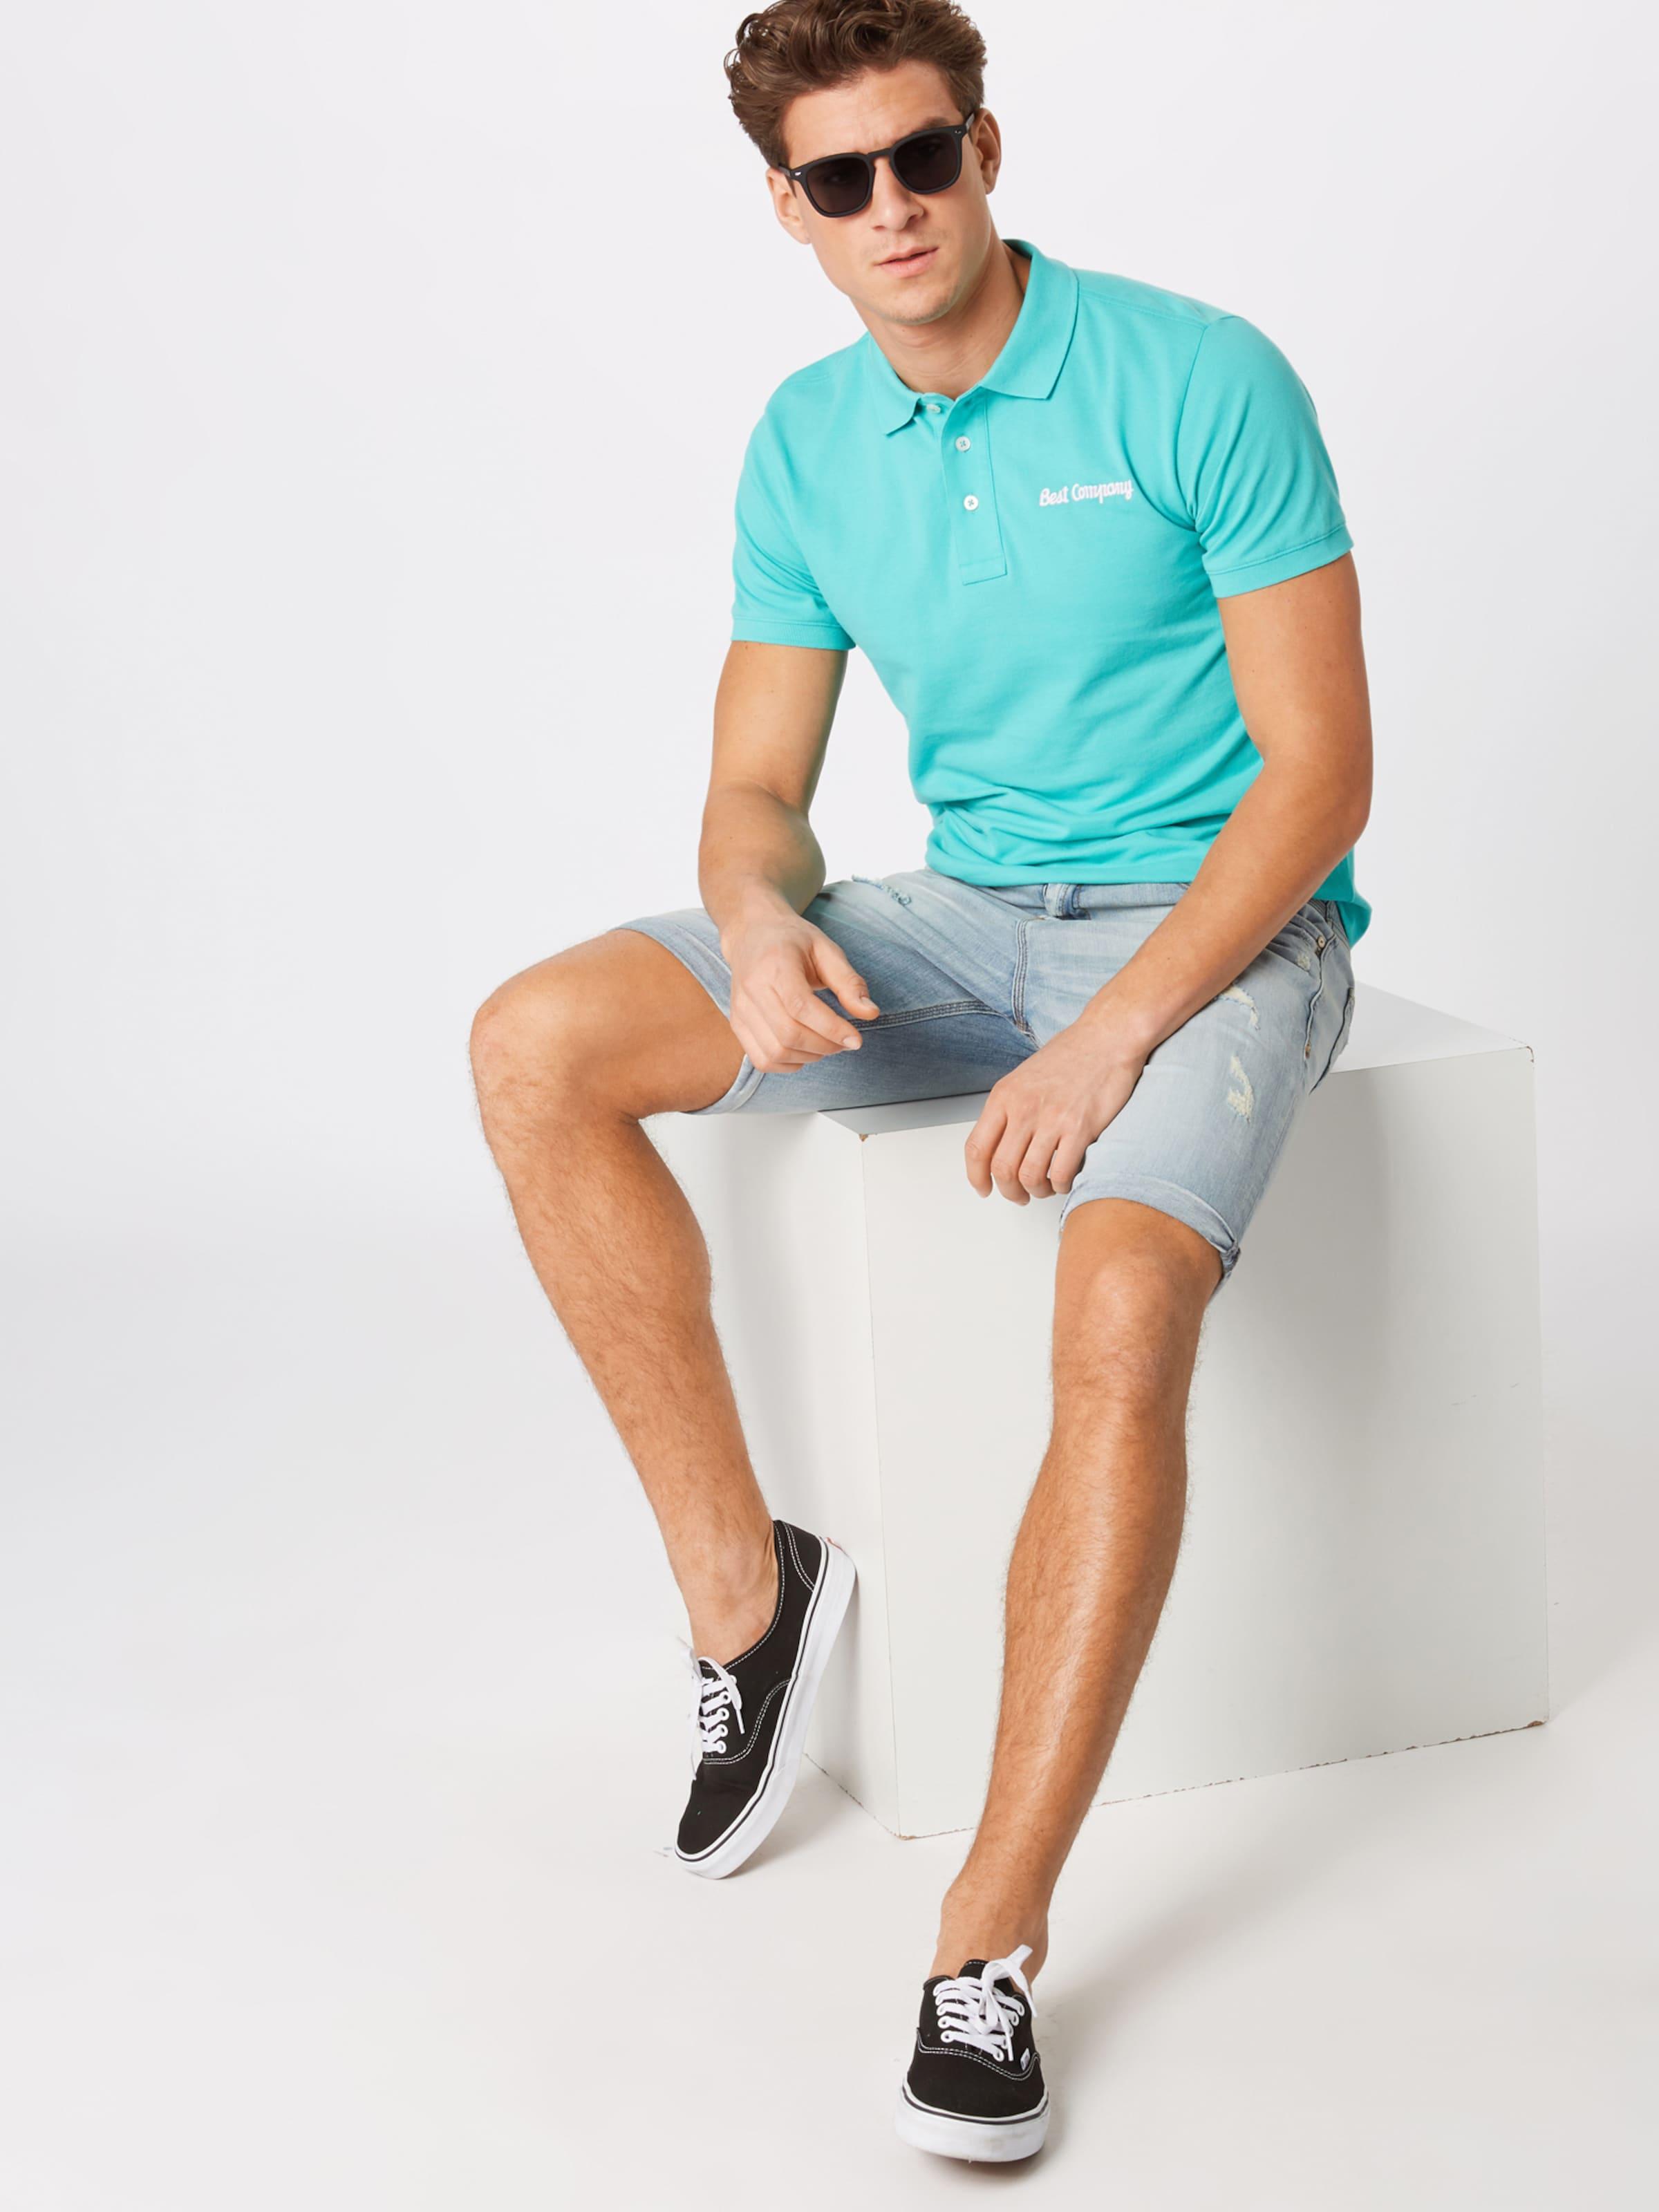 Poloshirt Best Aqua Poloshirt In Aqua Best Company In Company sdCthrQ